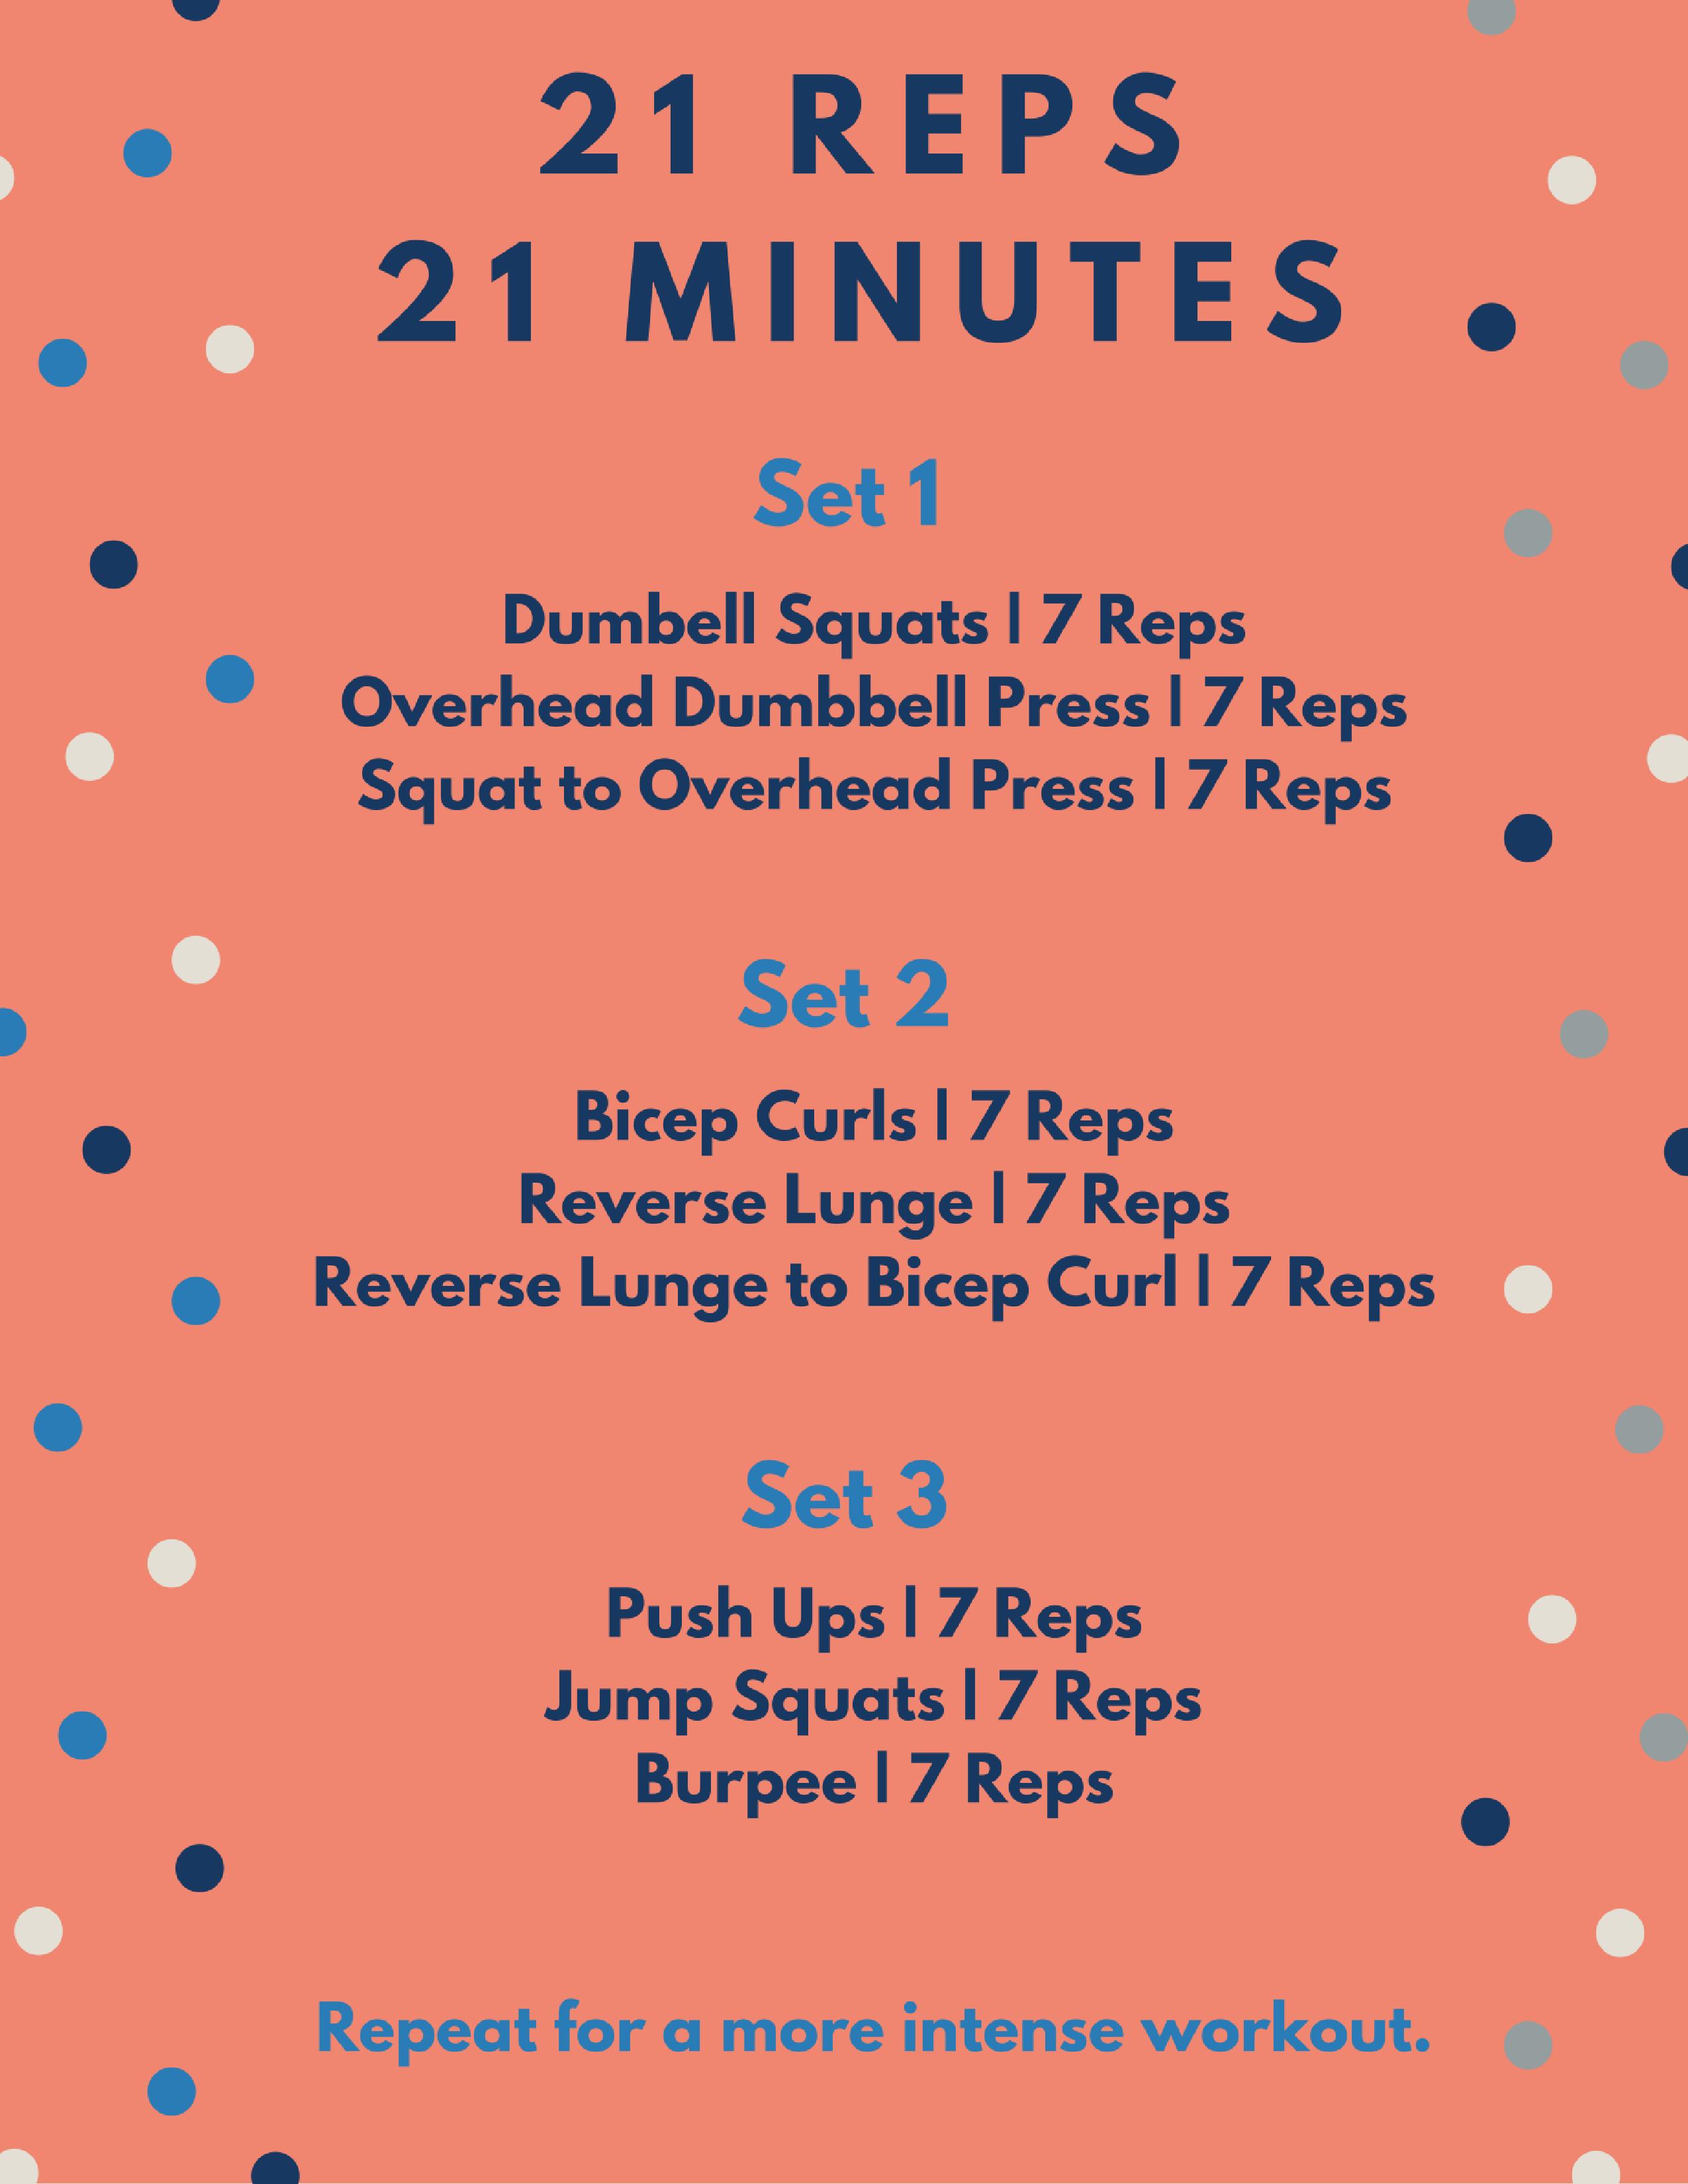 21-reps-21-minutes